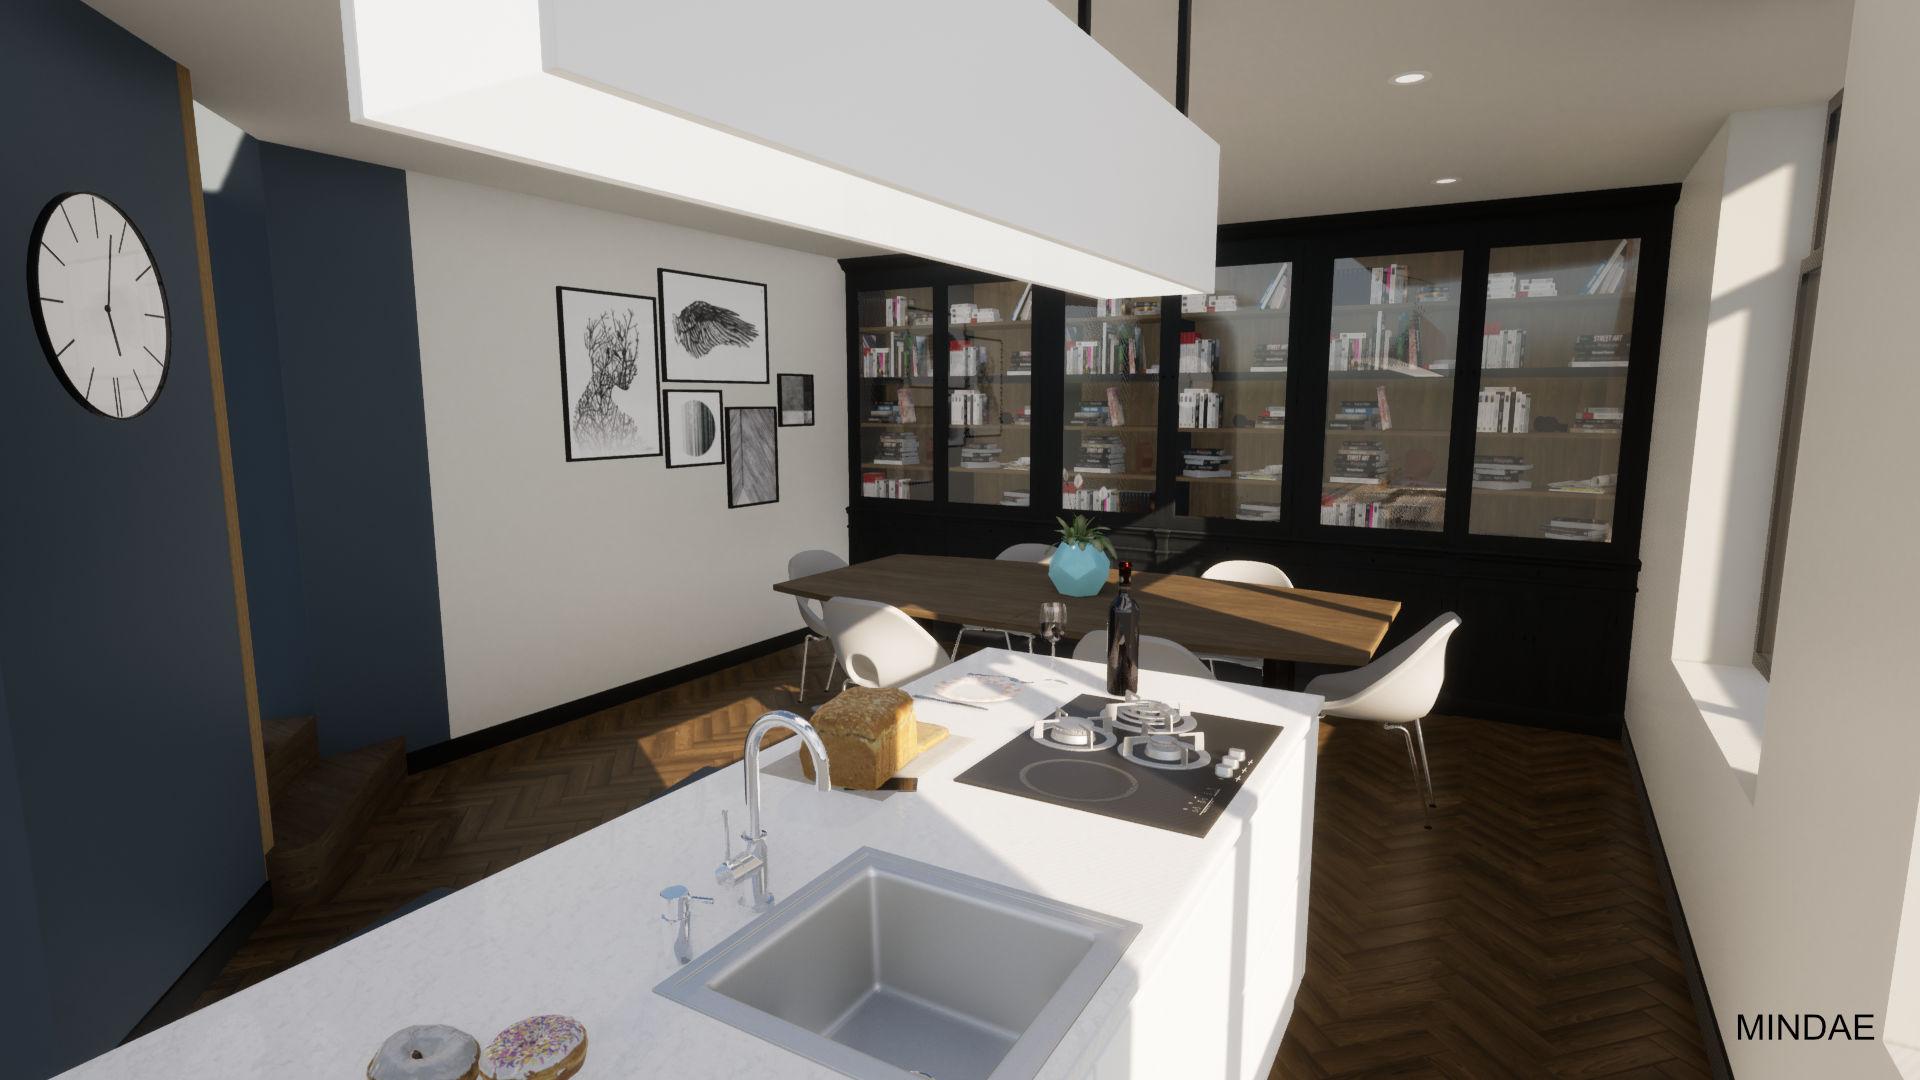 Mindae_Charleroi_Triplex_salle à manger_cuisine ouverte_bibliothèque (3)